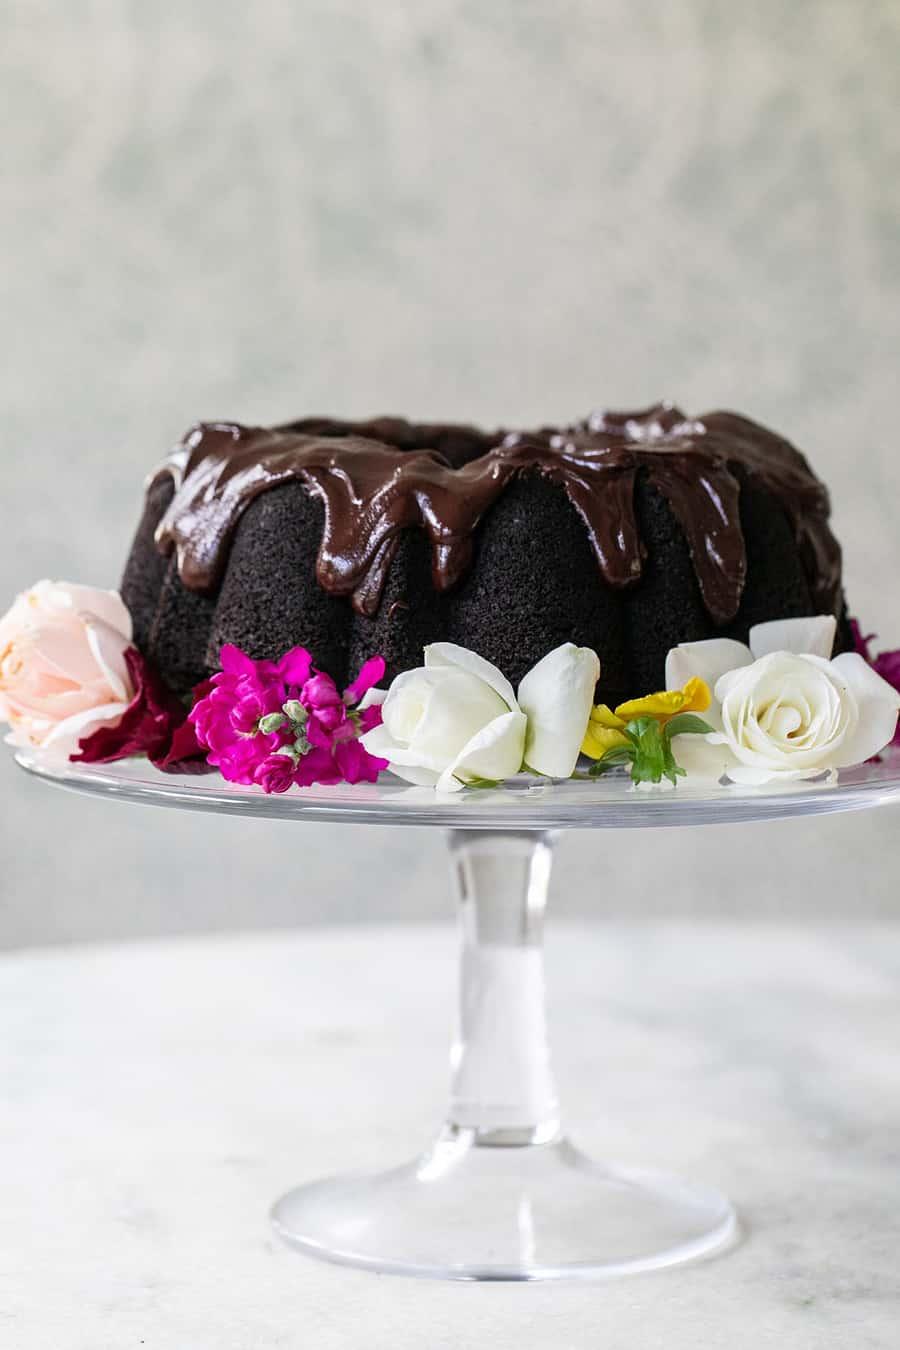 Chocolate bundt cake with flowers